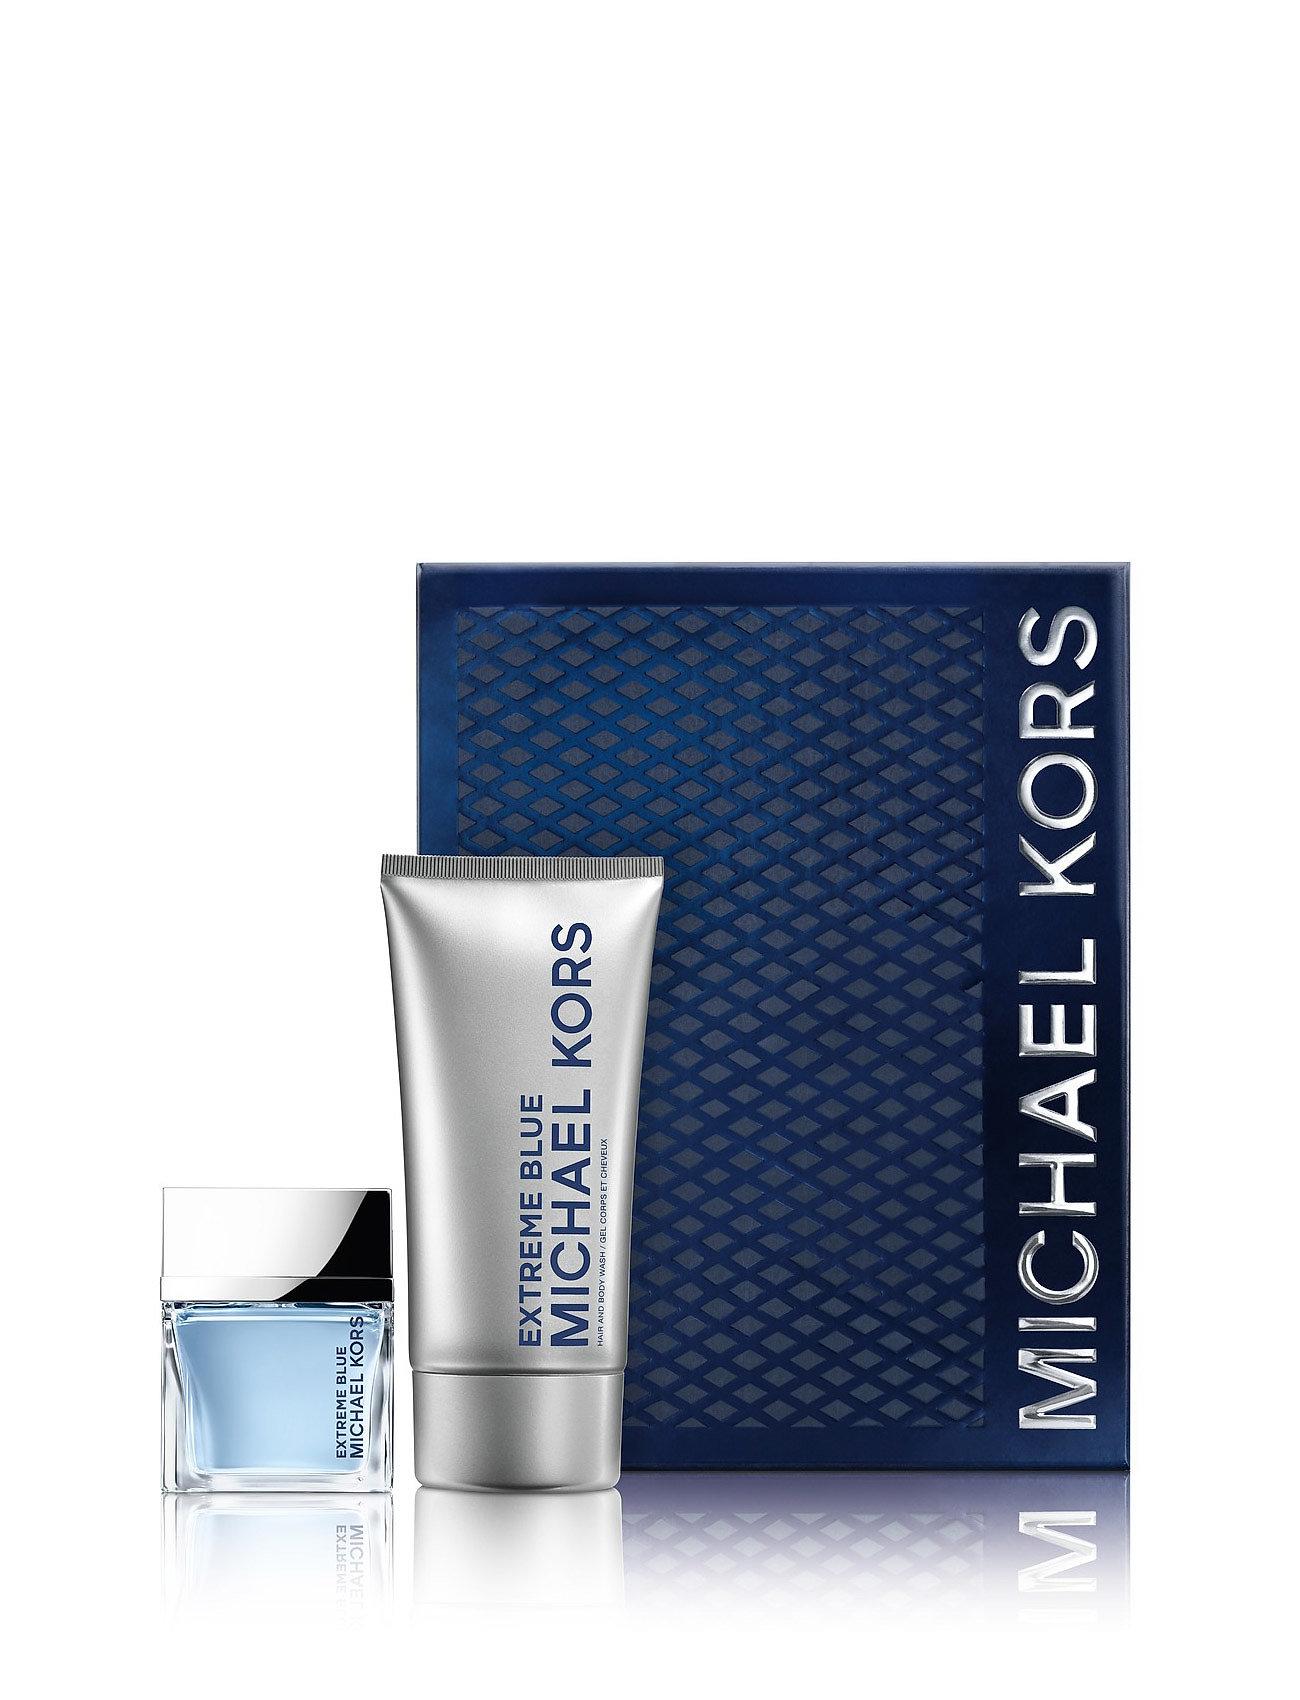 Michael Kors Fragrance EXTREME BLUE MEN SET W. EDT 70ML / BODY WASH 150 ML - NO COLOR